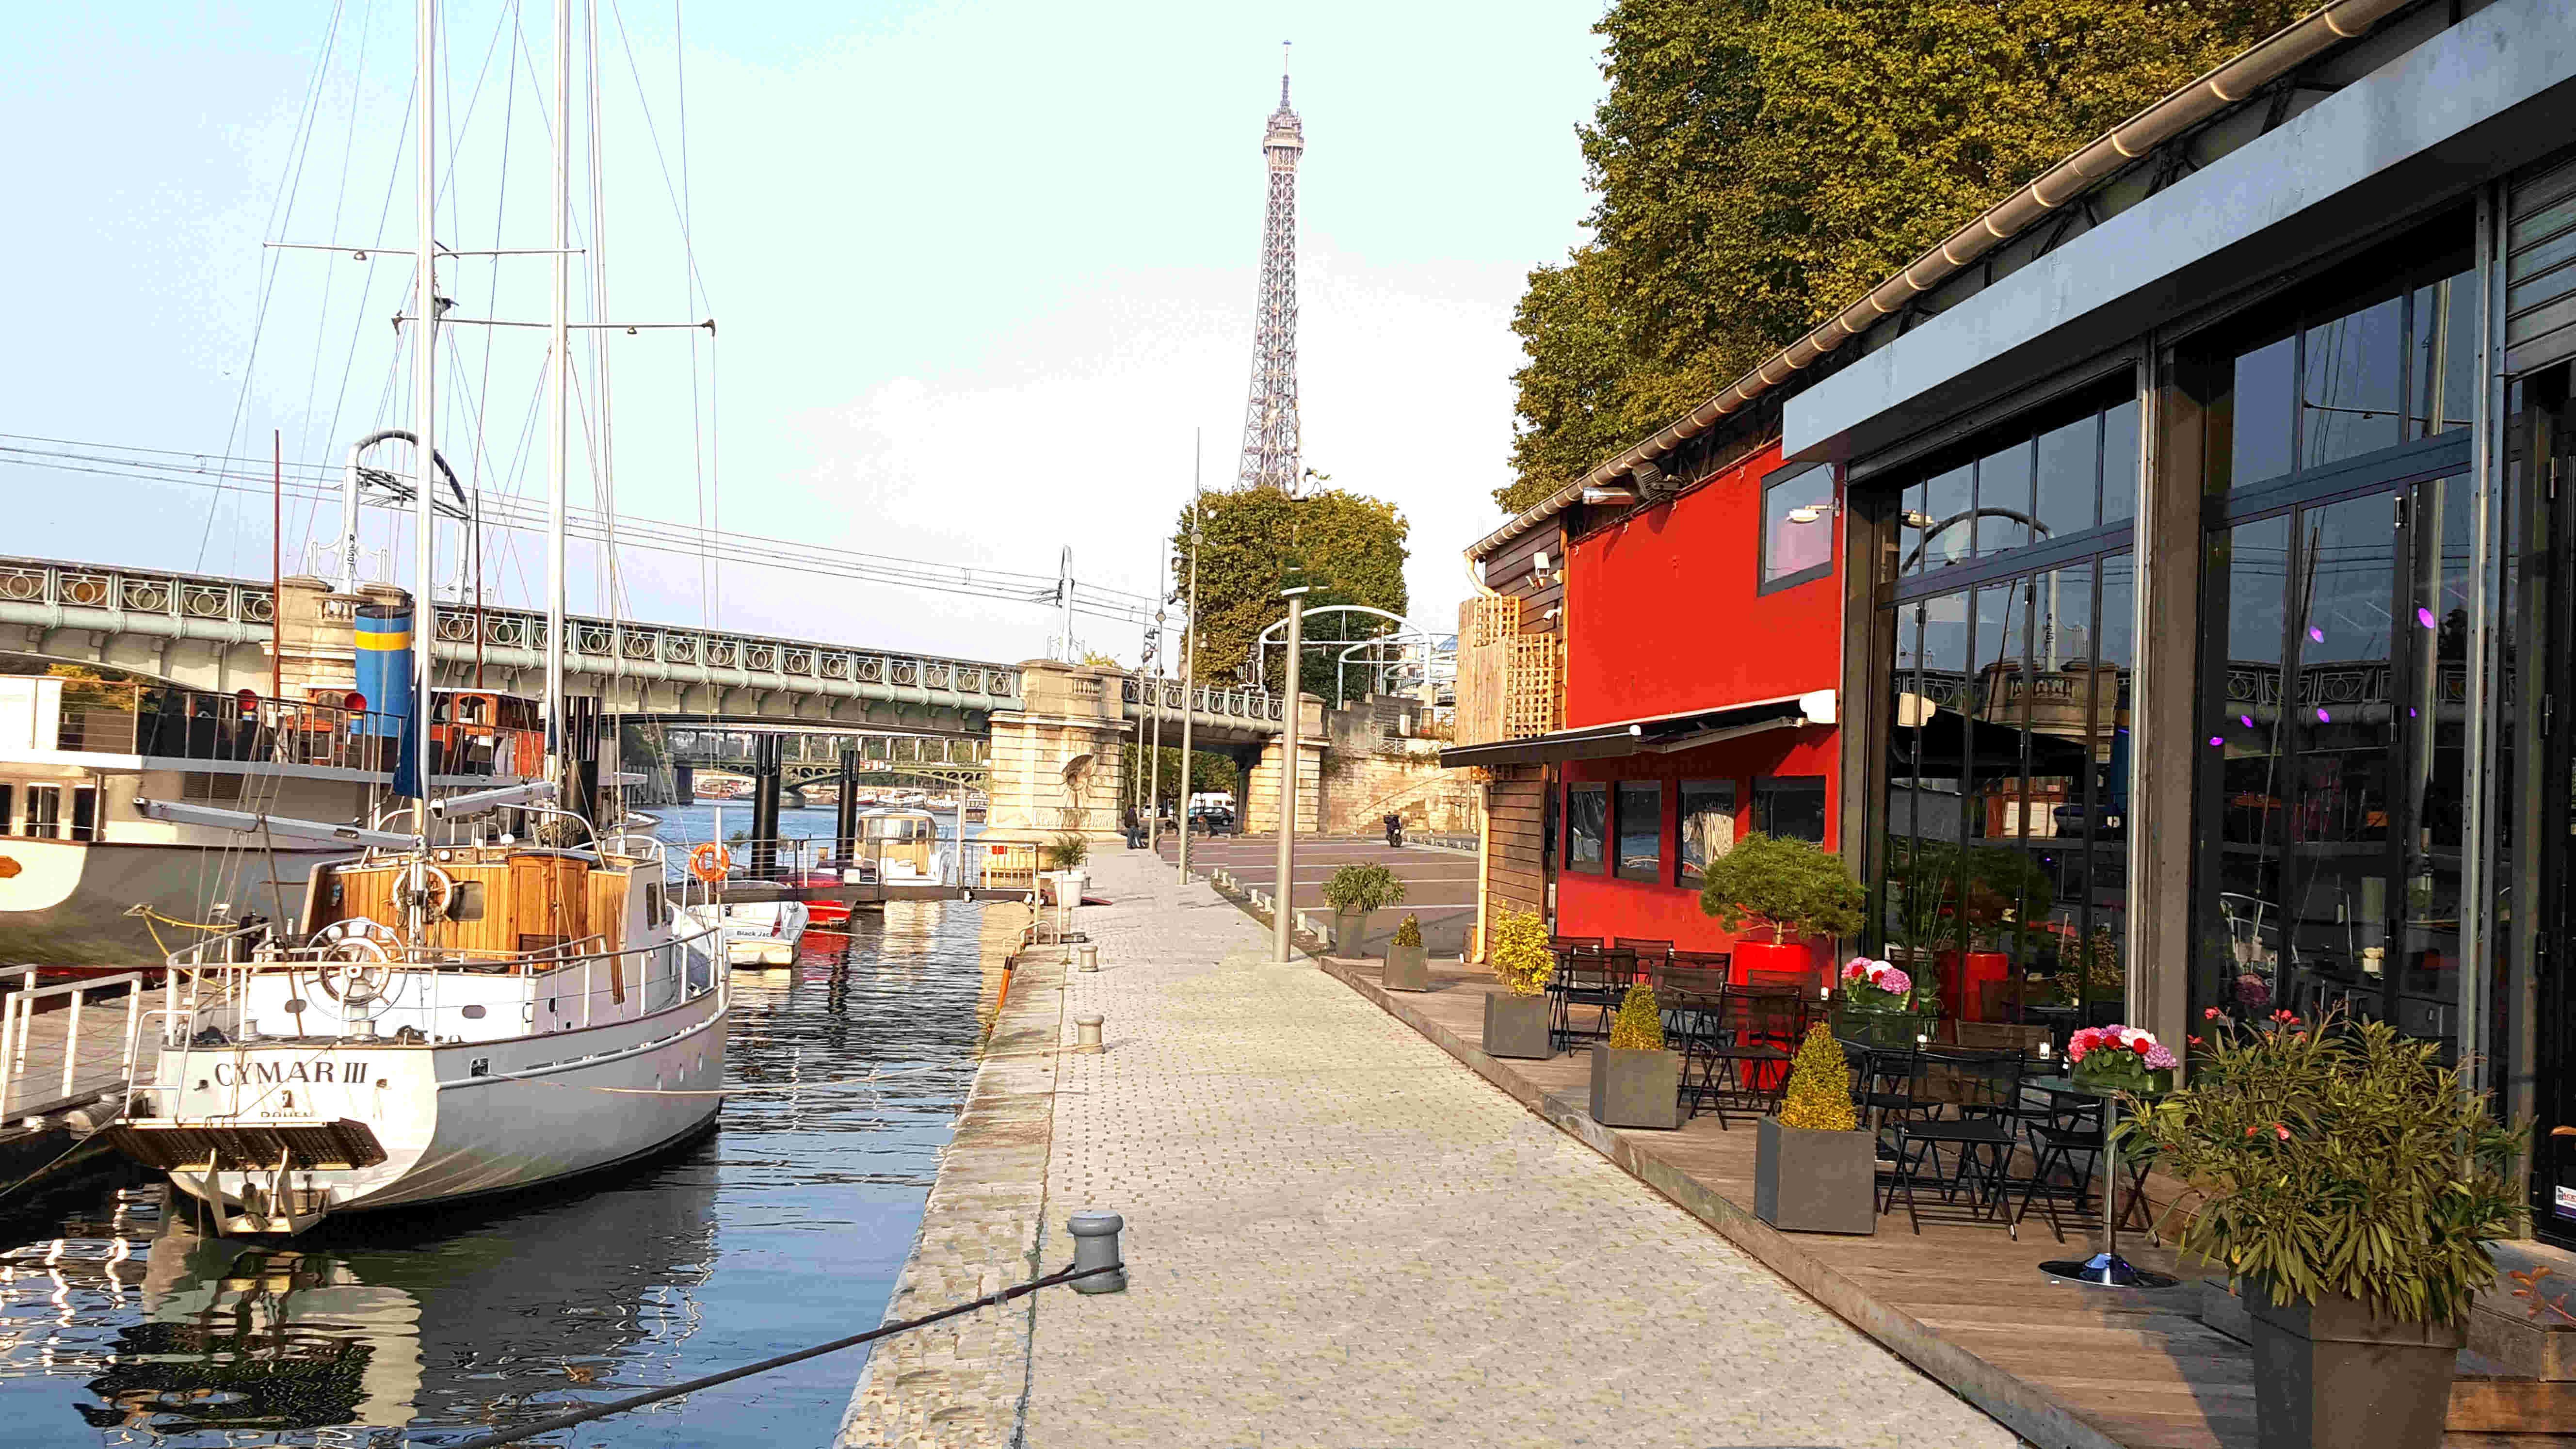 Cymar bateau parisien